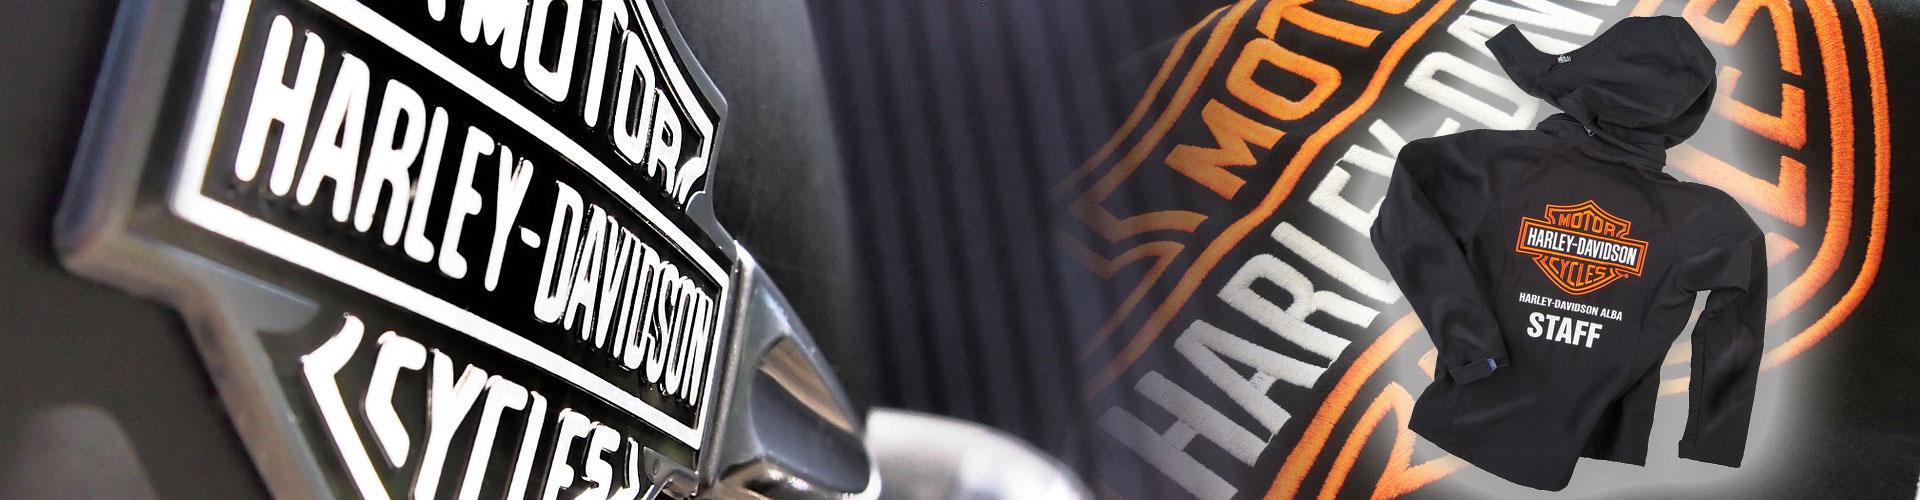 Slider-1920x500_Scavino-Harley